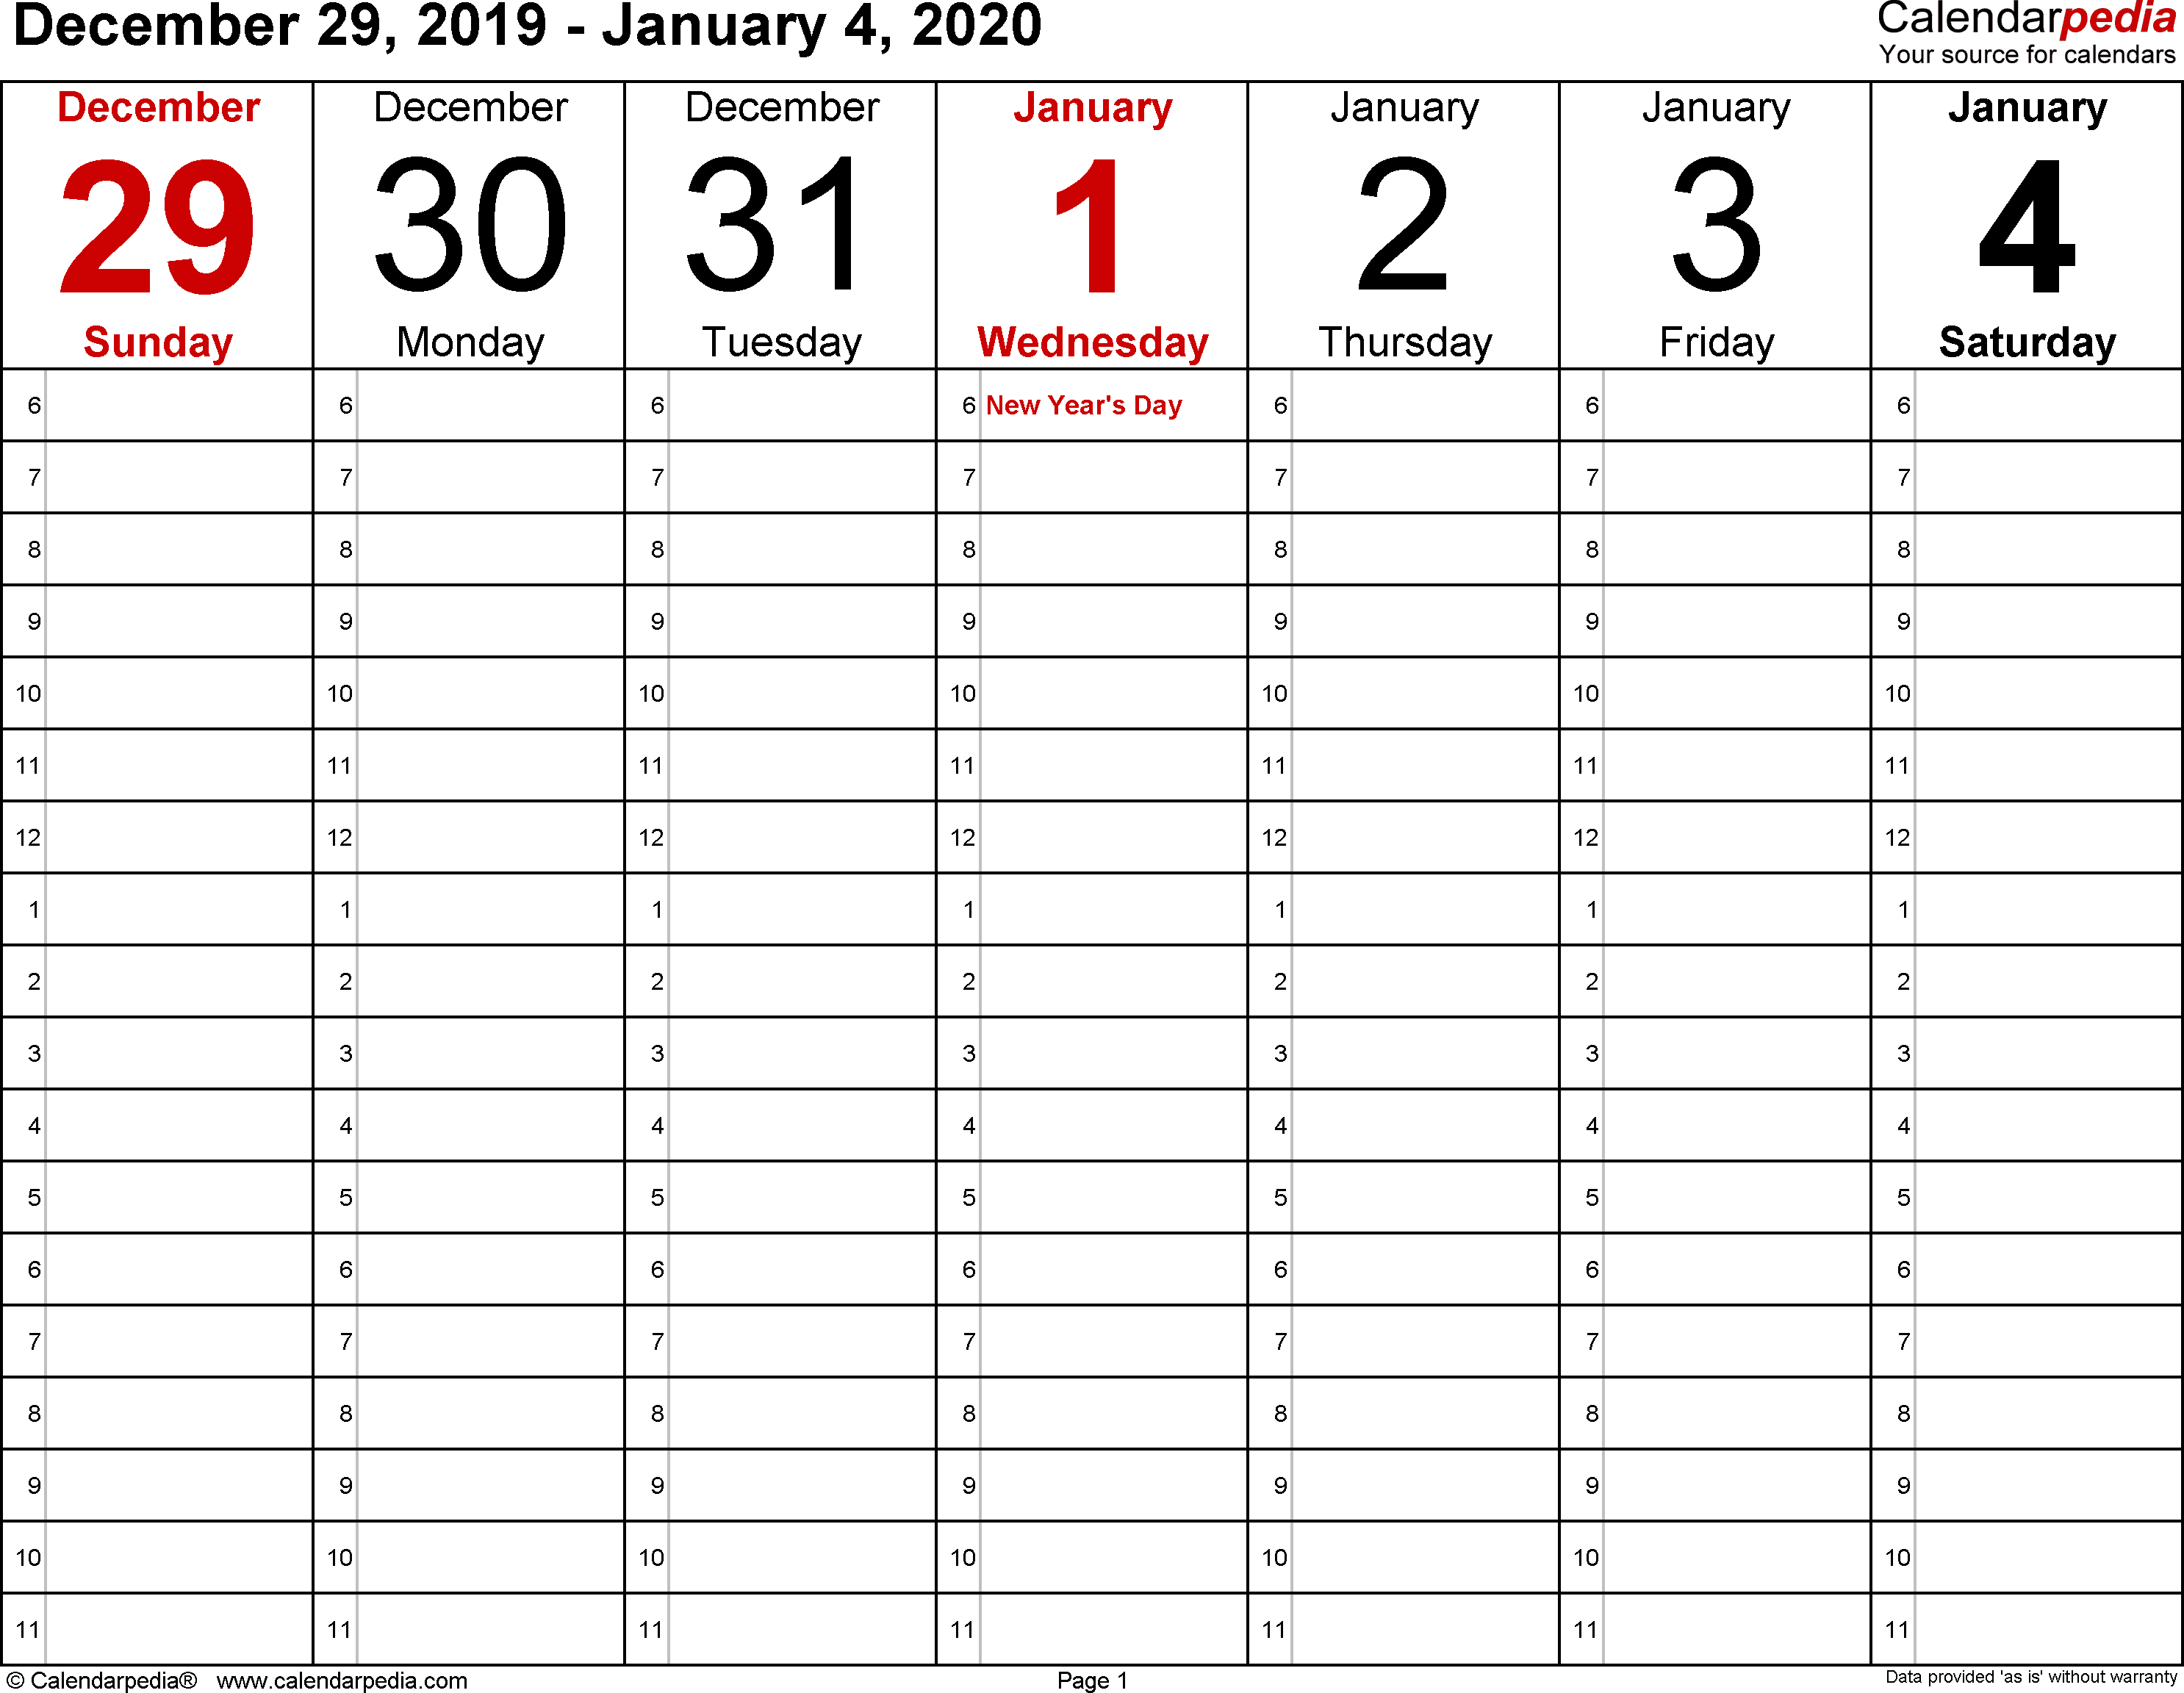 2020 Weekly Calendar - Wpa.wpart.co